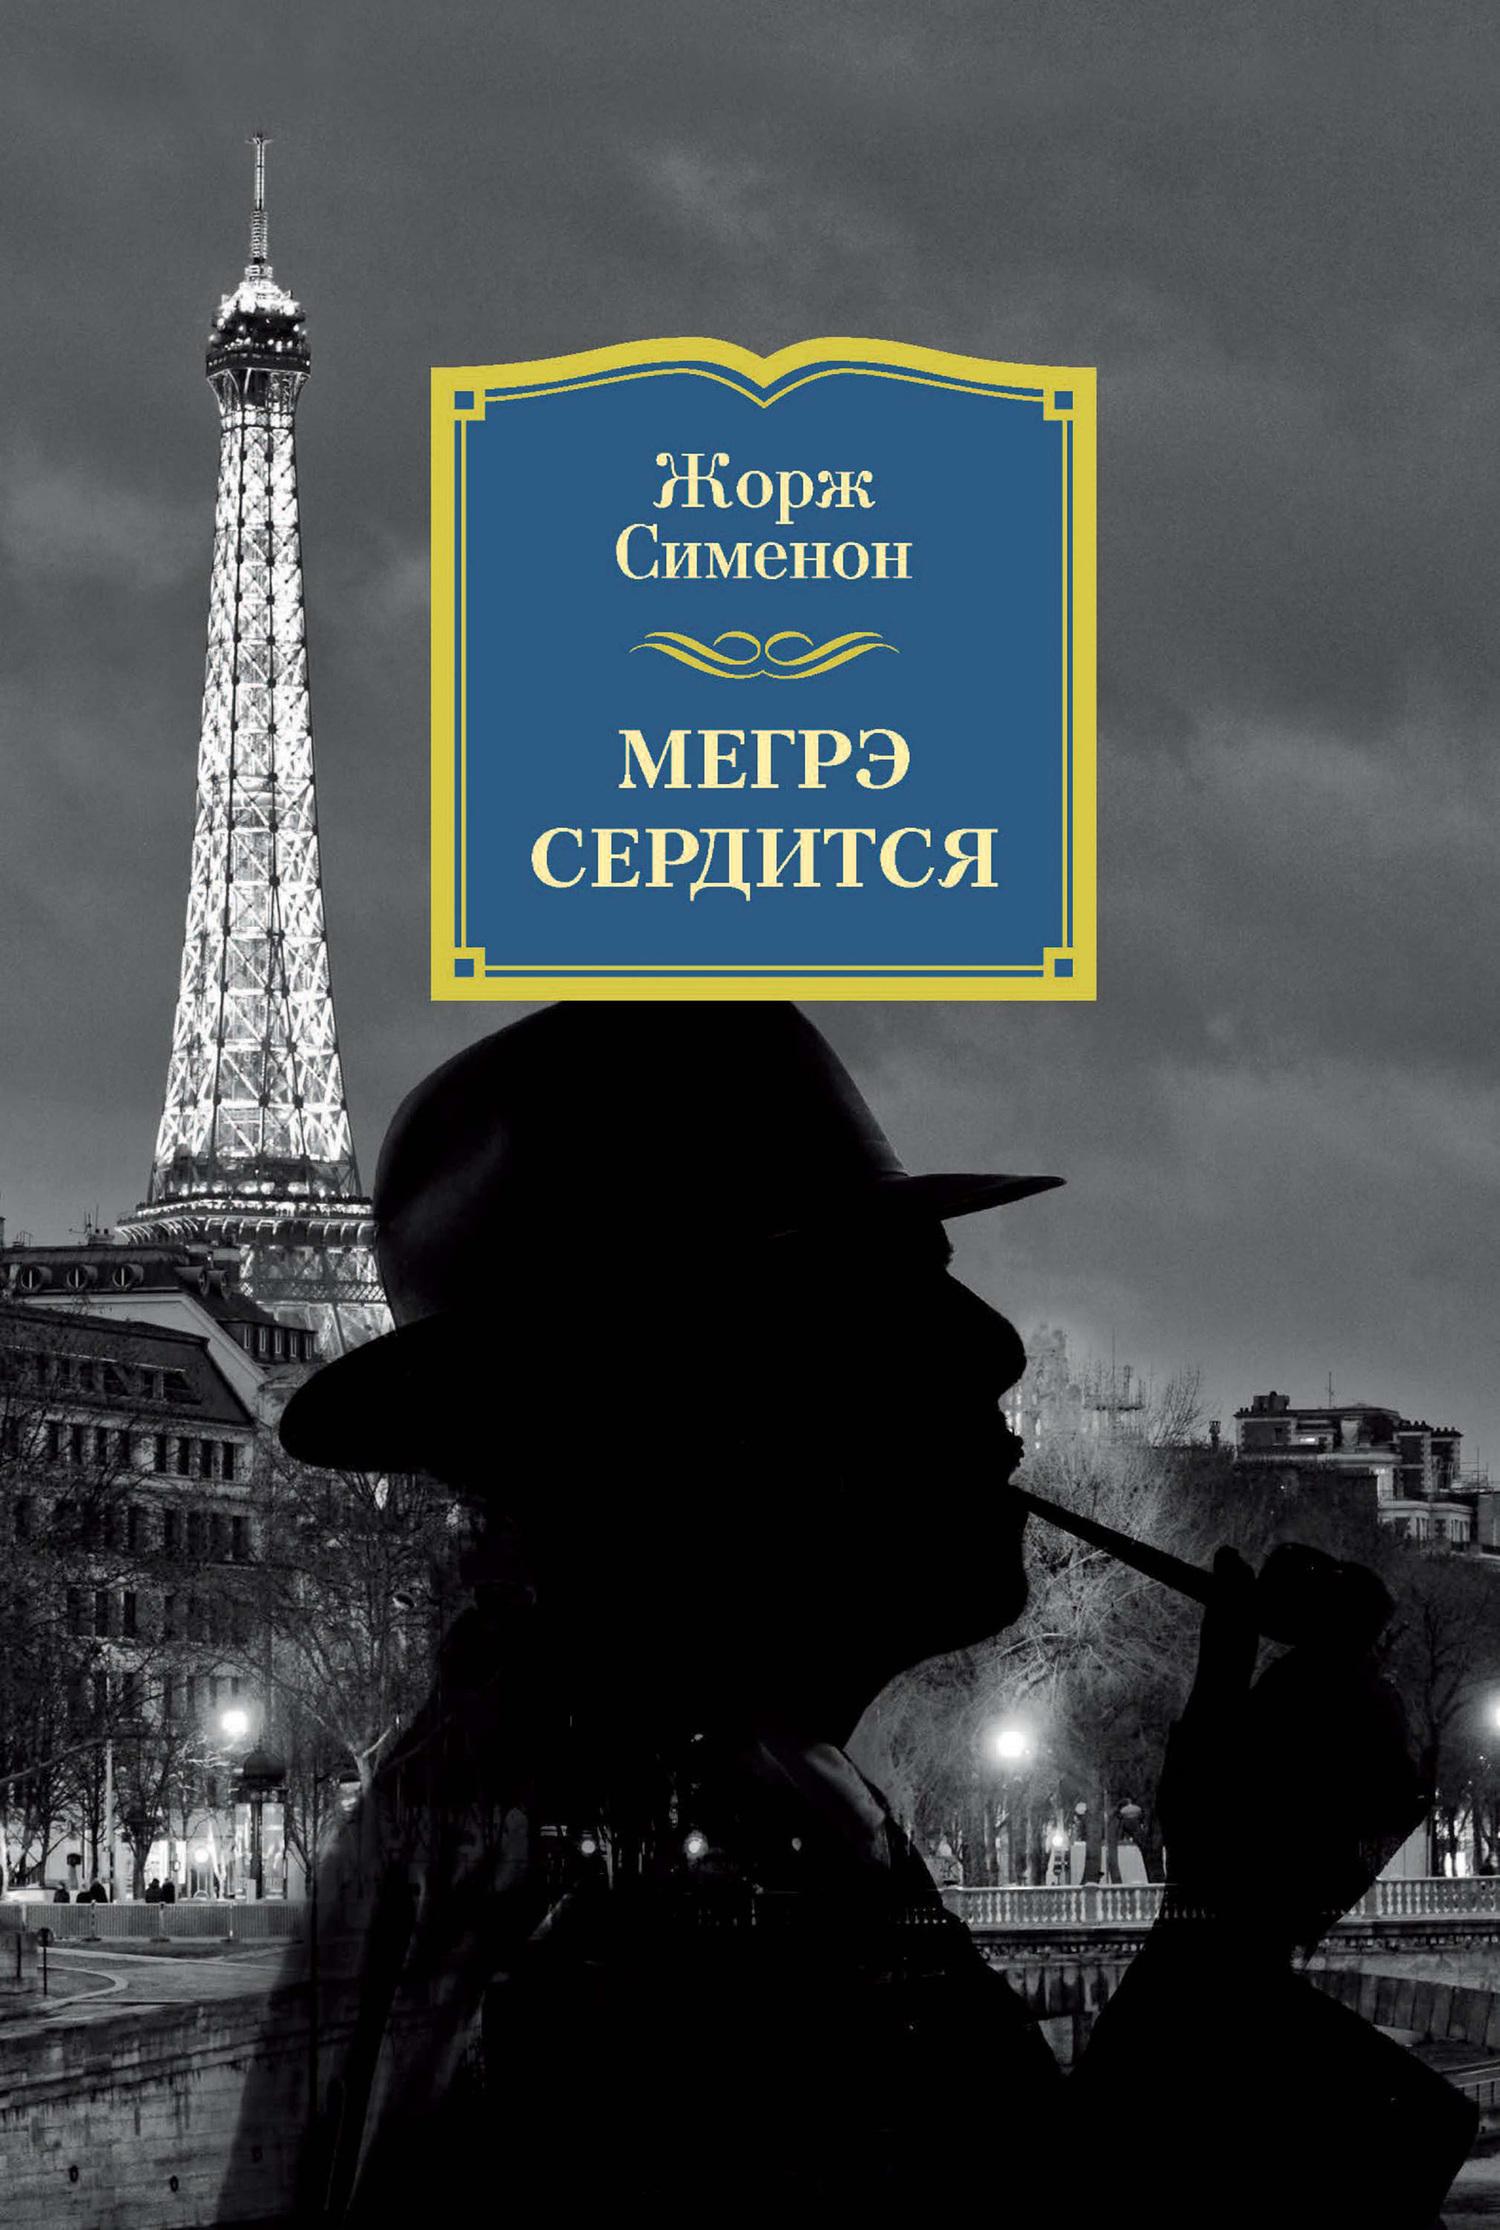 Жорж Сименон Мегрэ сердится сименон ж комиссар мегрэ собрание сочинений в одной книге